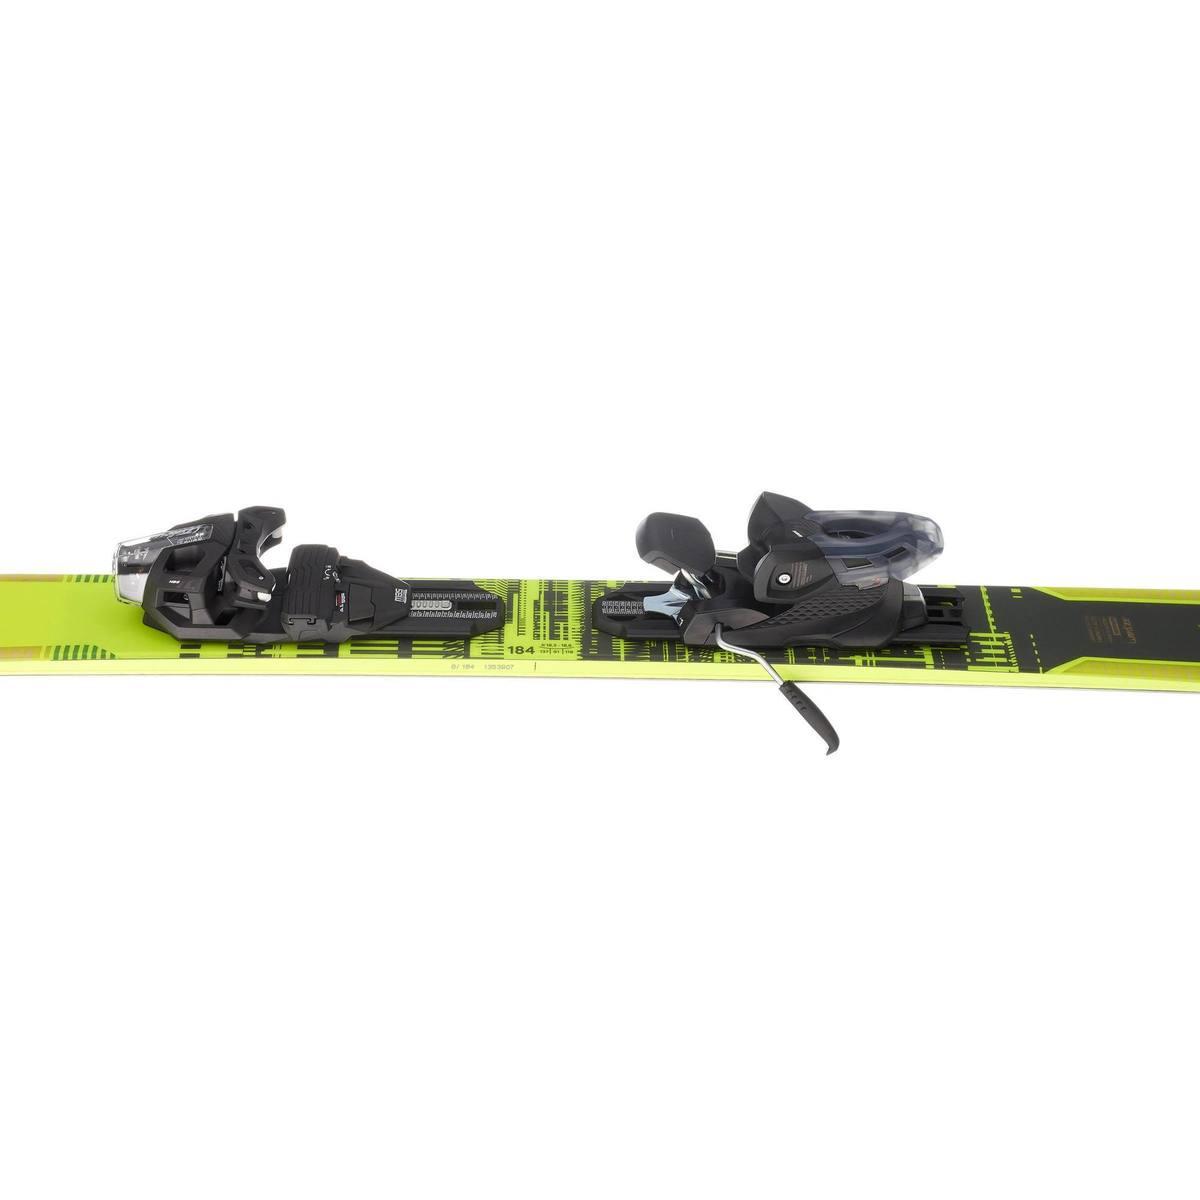 Bild 4 von Ski Freeride Samurai 500 gelb